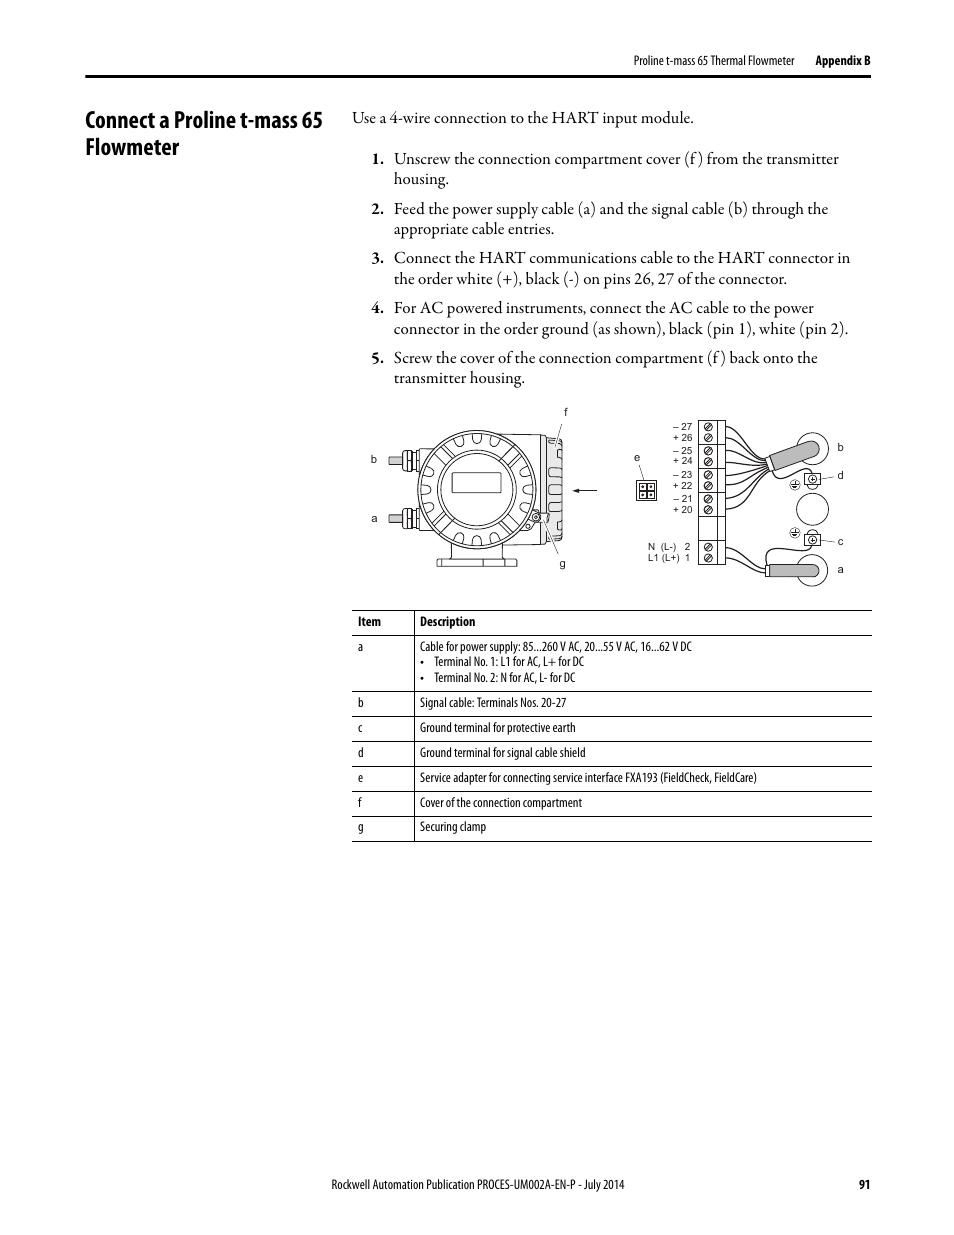 ... manuals topmalawis de Array - connect a proline t mass 65 flowmeter  rockwell automation 1734sc rh manualsdir com